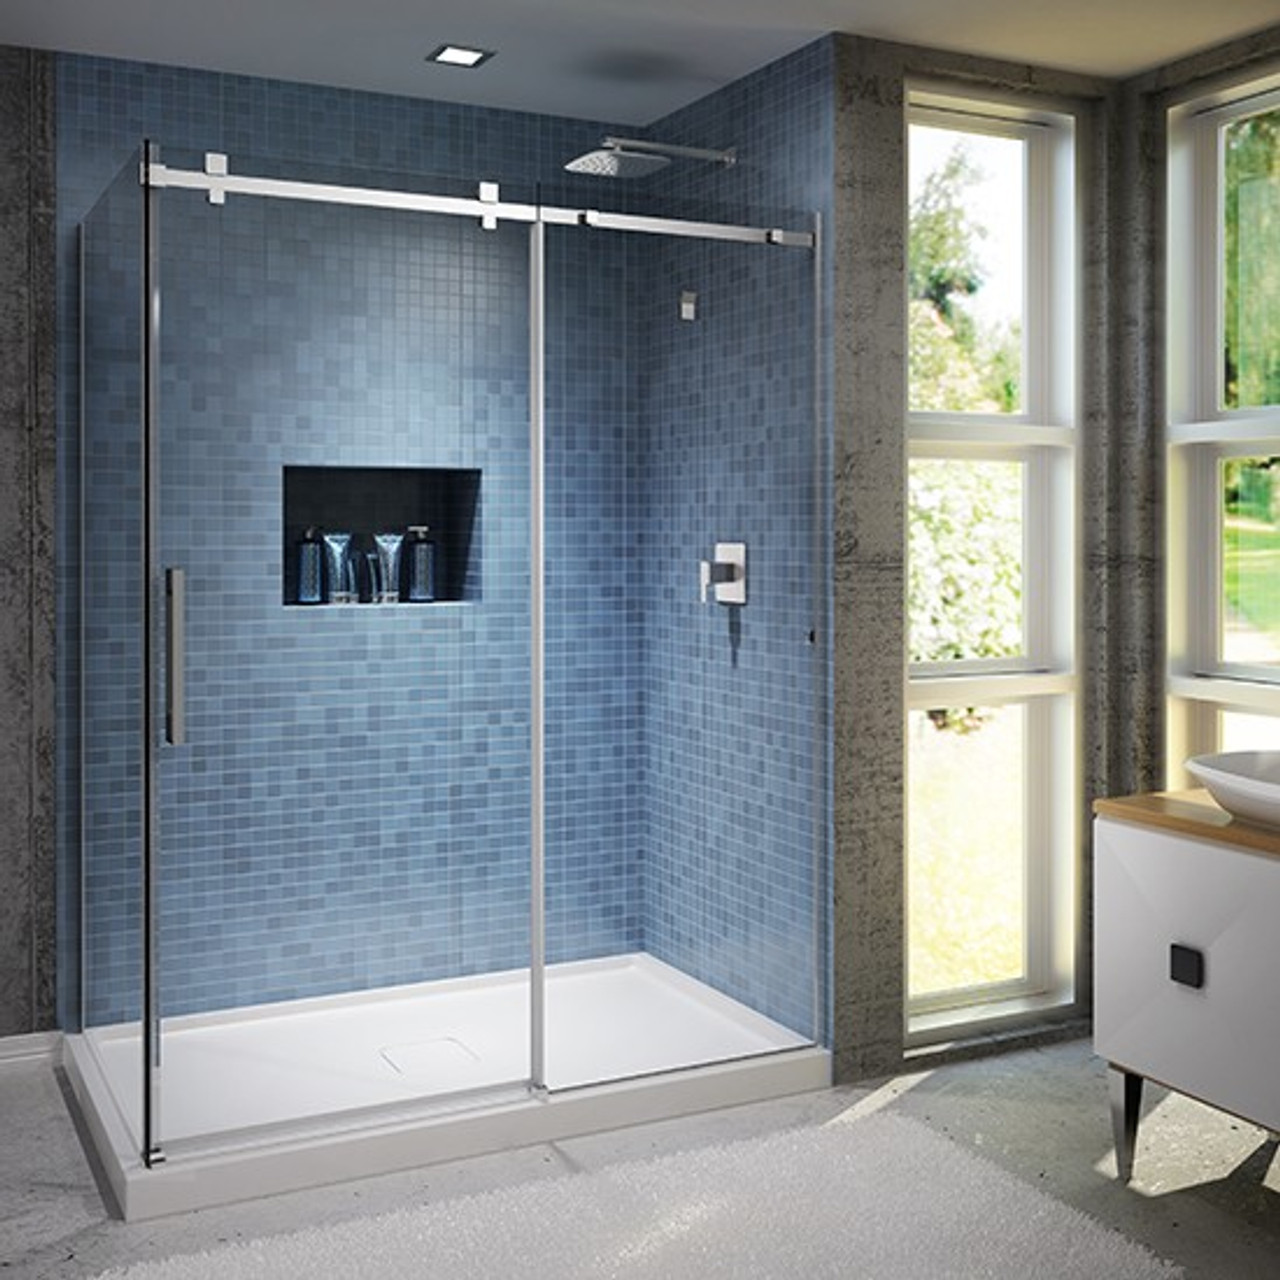 Kalia Rollax Square Sliding Doors Shower Enclosure 60x 32x 77